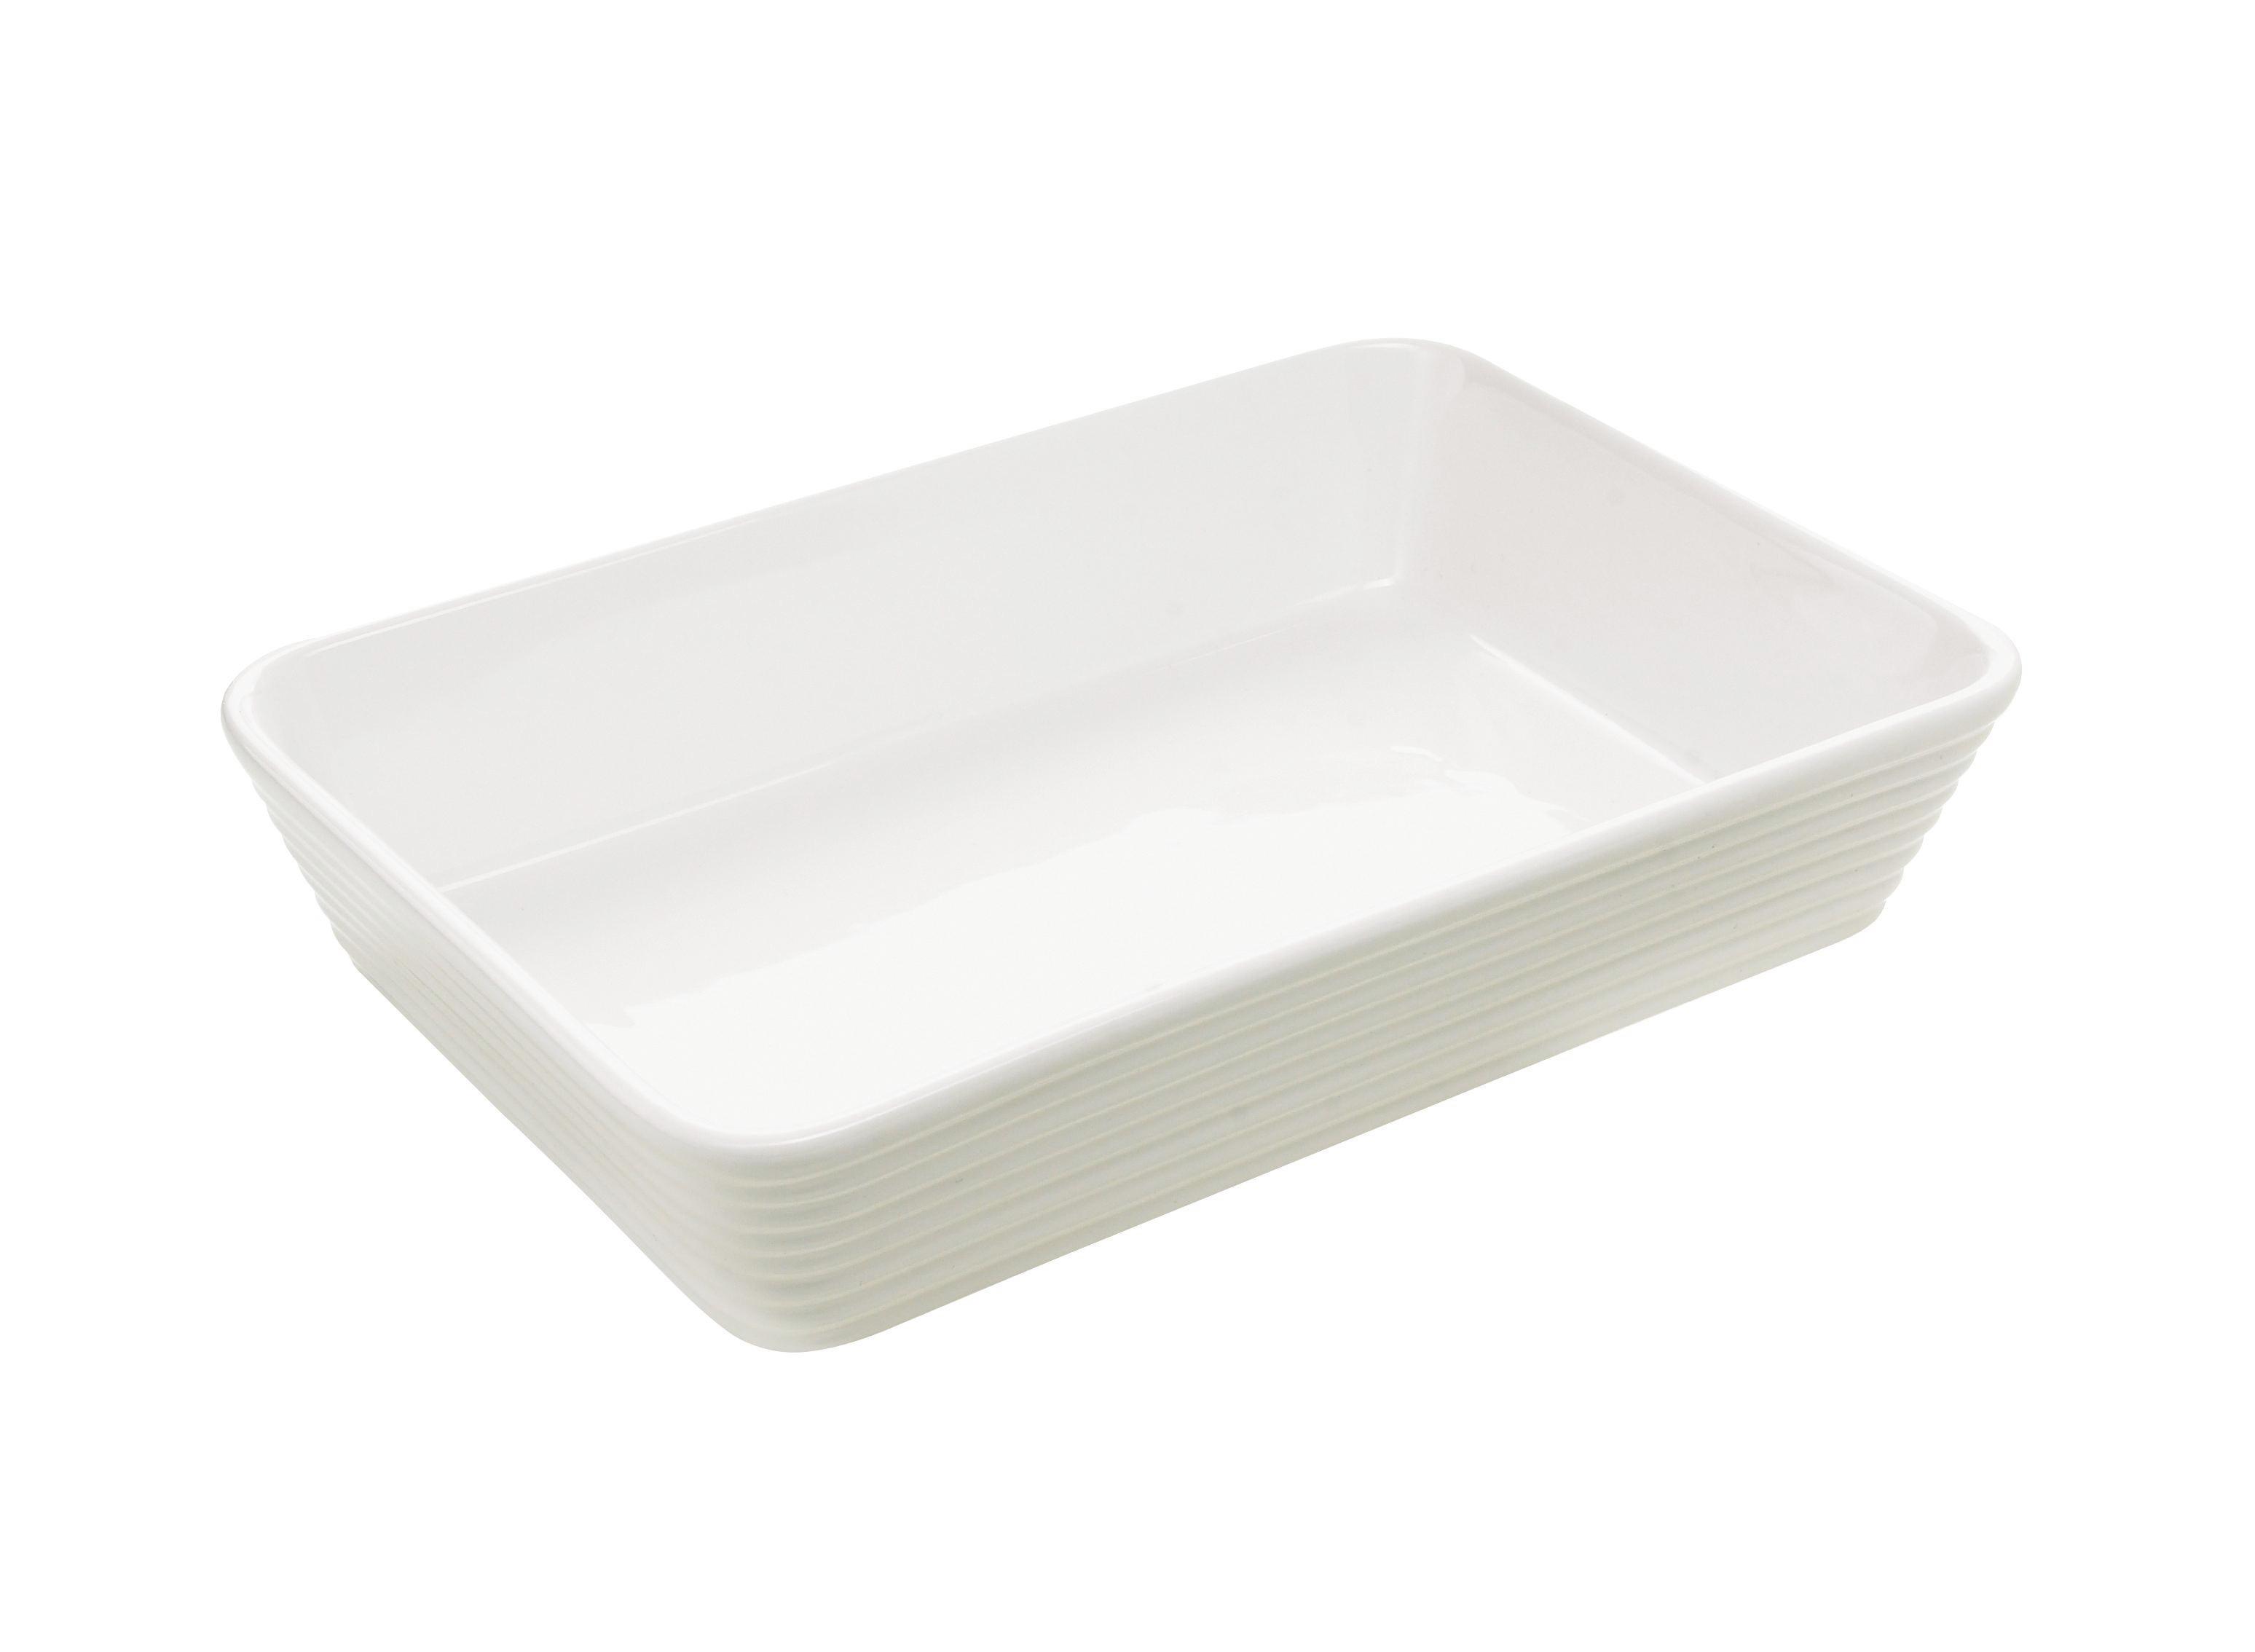 PEKAČ - bela, Konvencionalno, keramika (29,5/20/6cm) - HOMEWARE